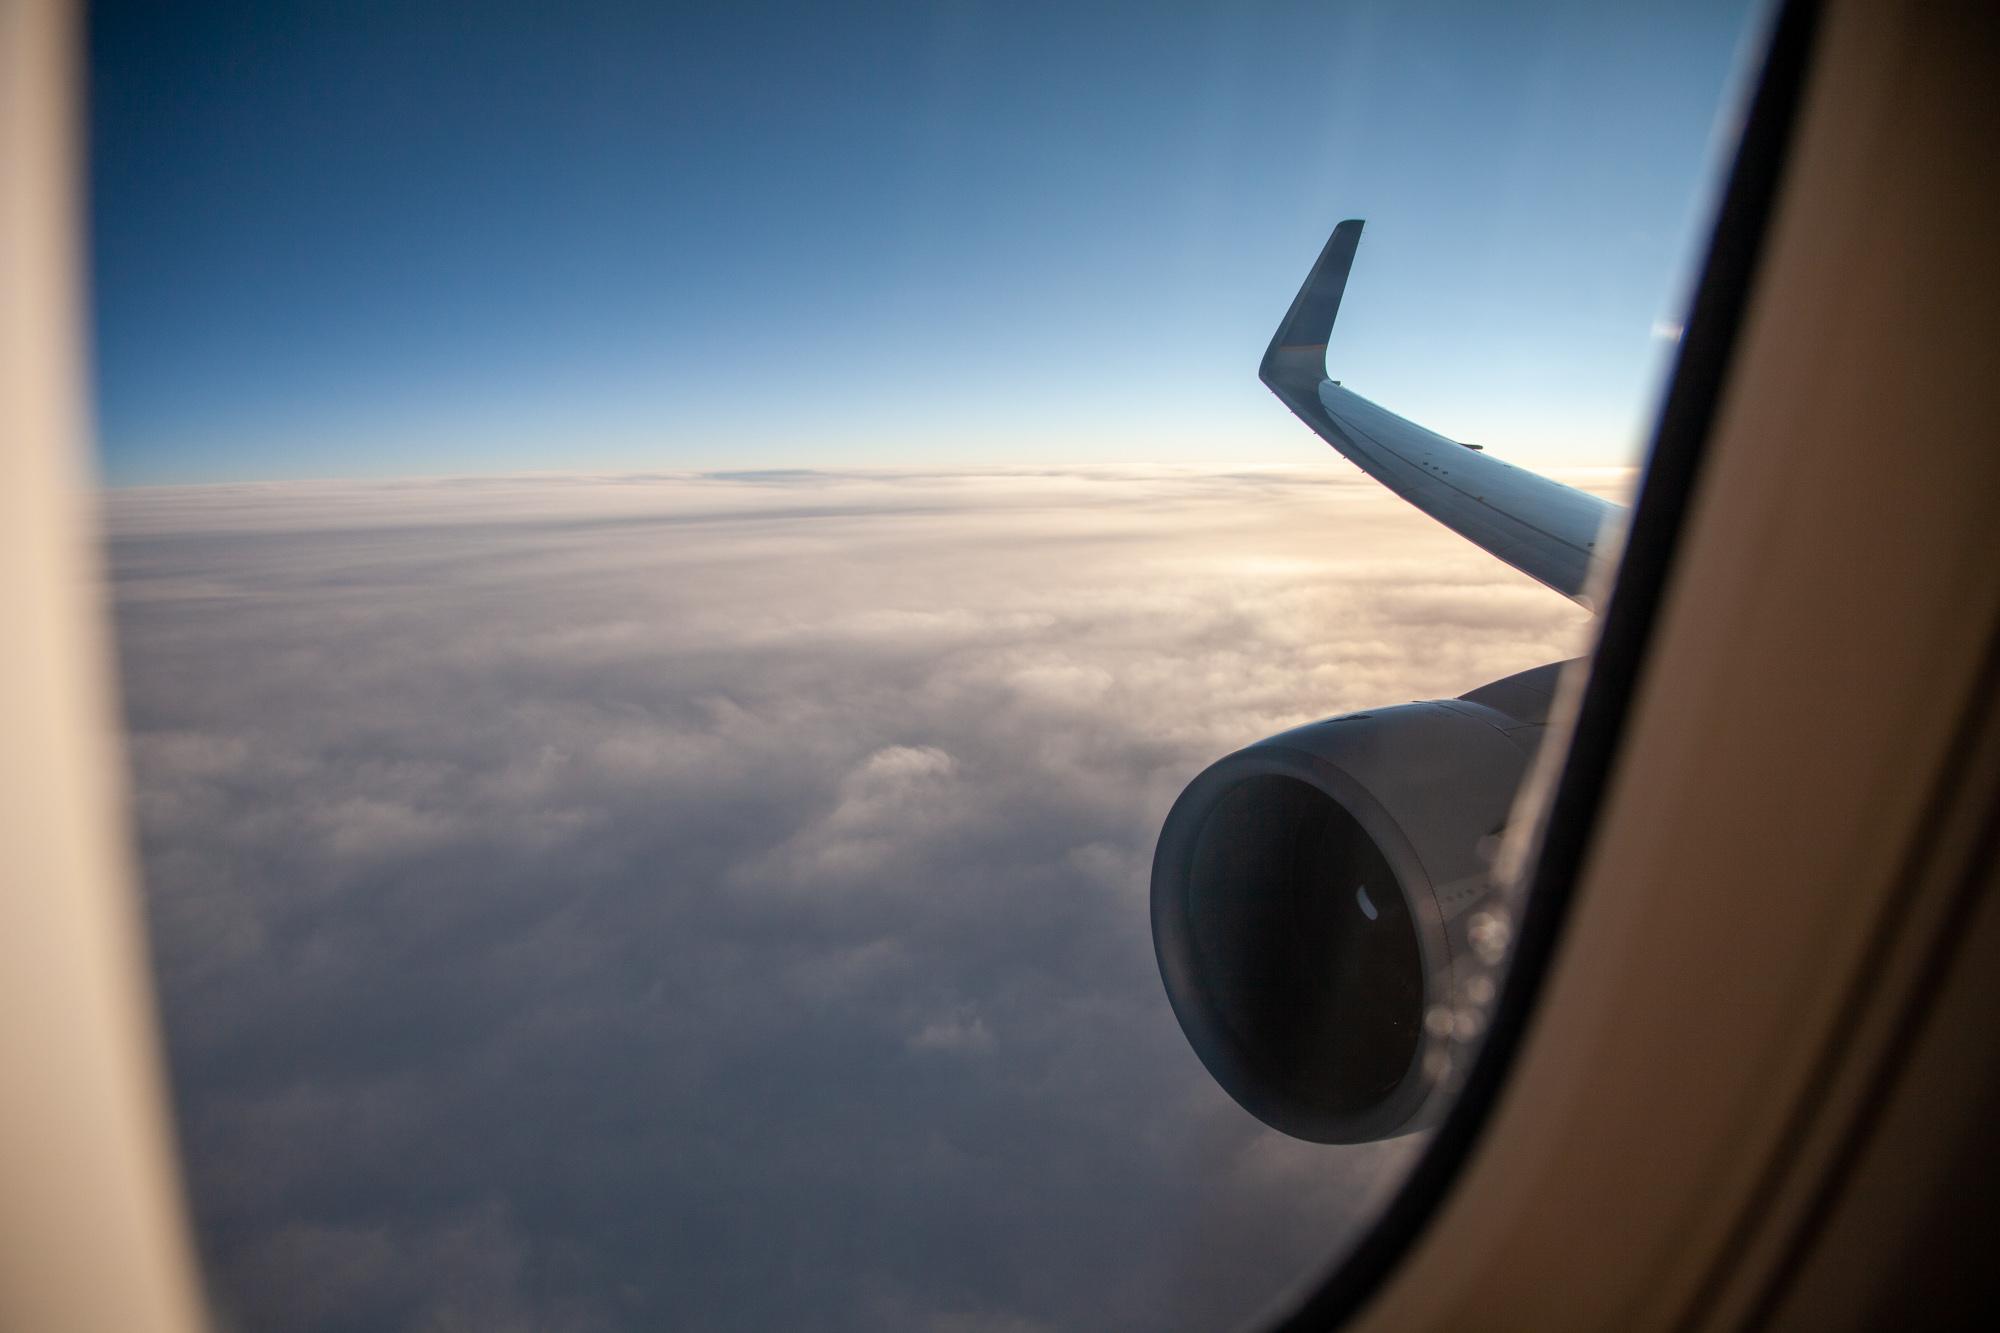 United 767-300ER wing shot transatlantic Polaris business class pandemic